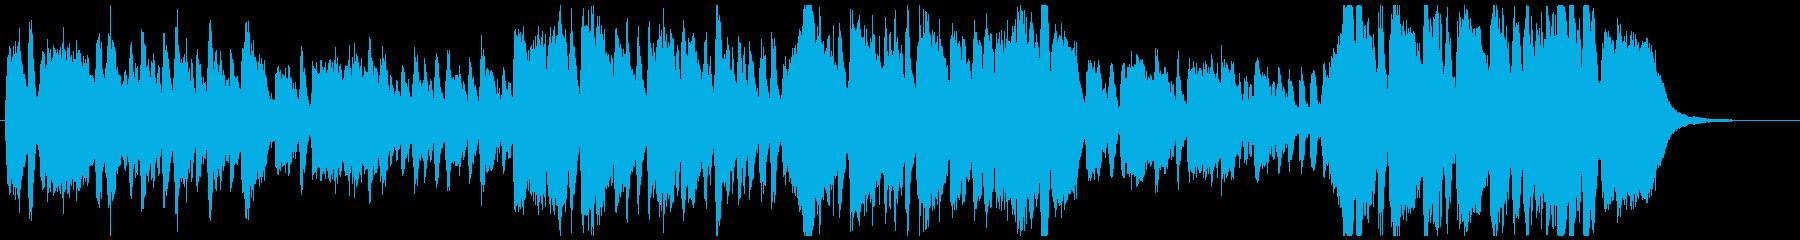 BWV1067/6『メヌエット』バッハの再生済みの波形